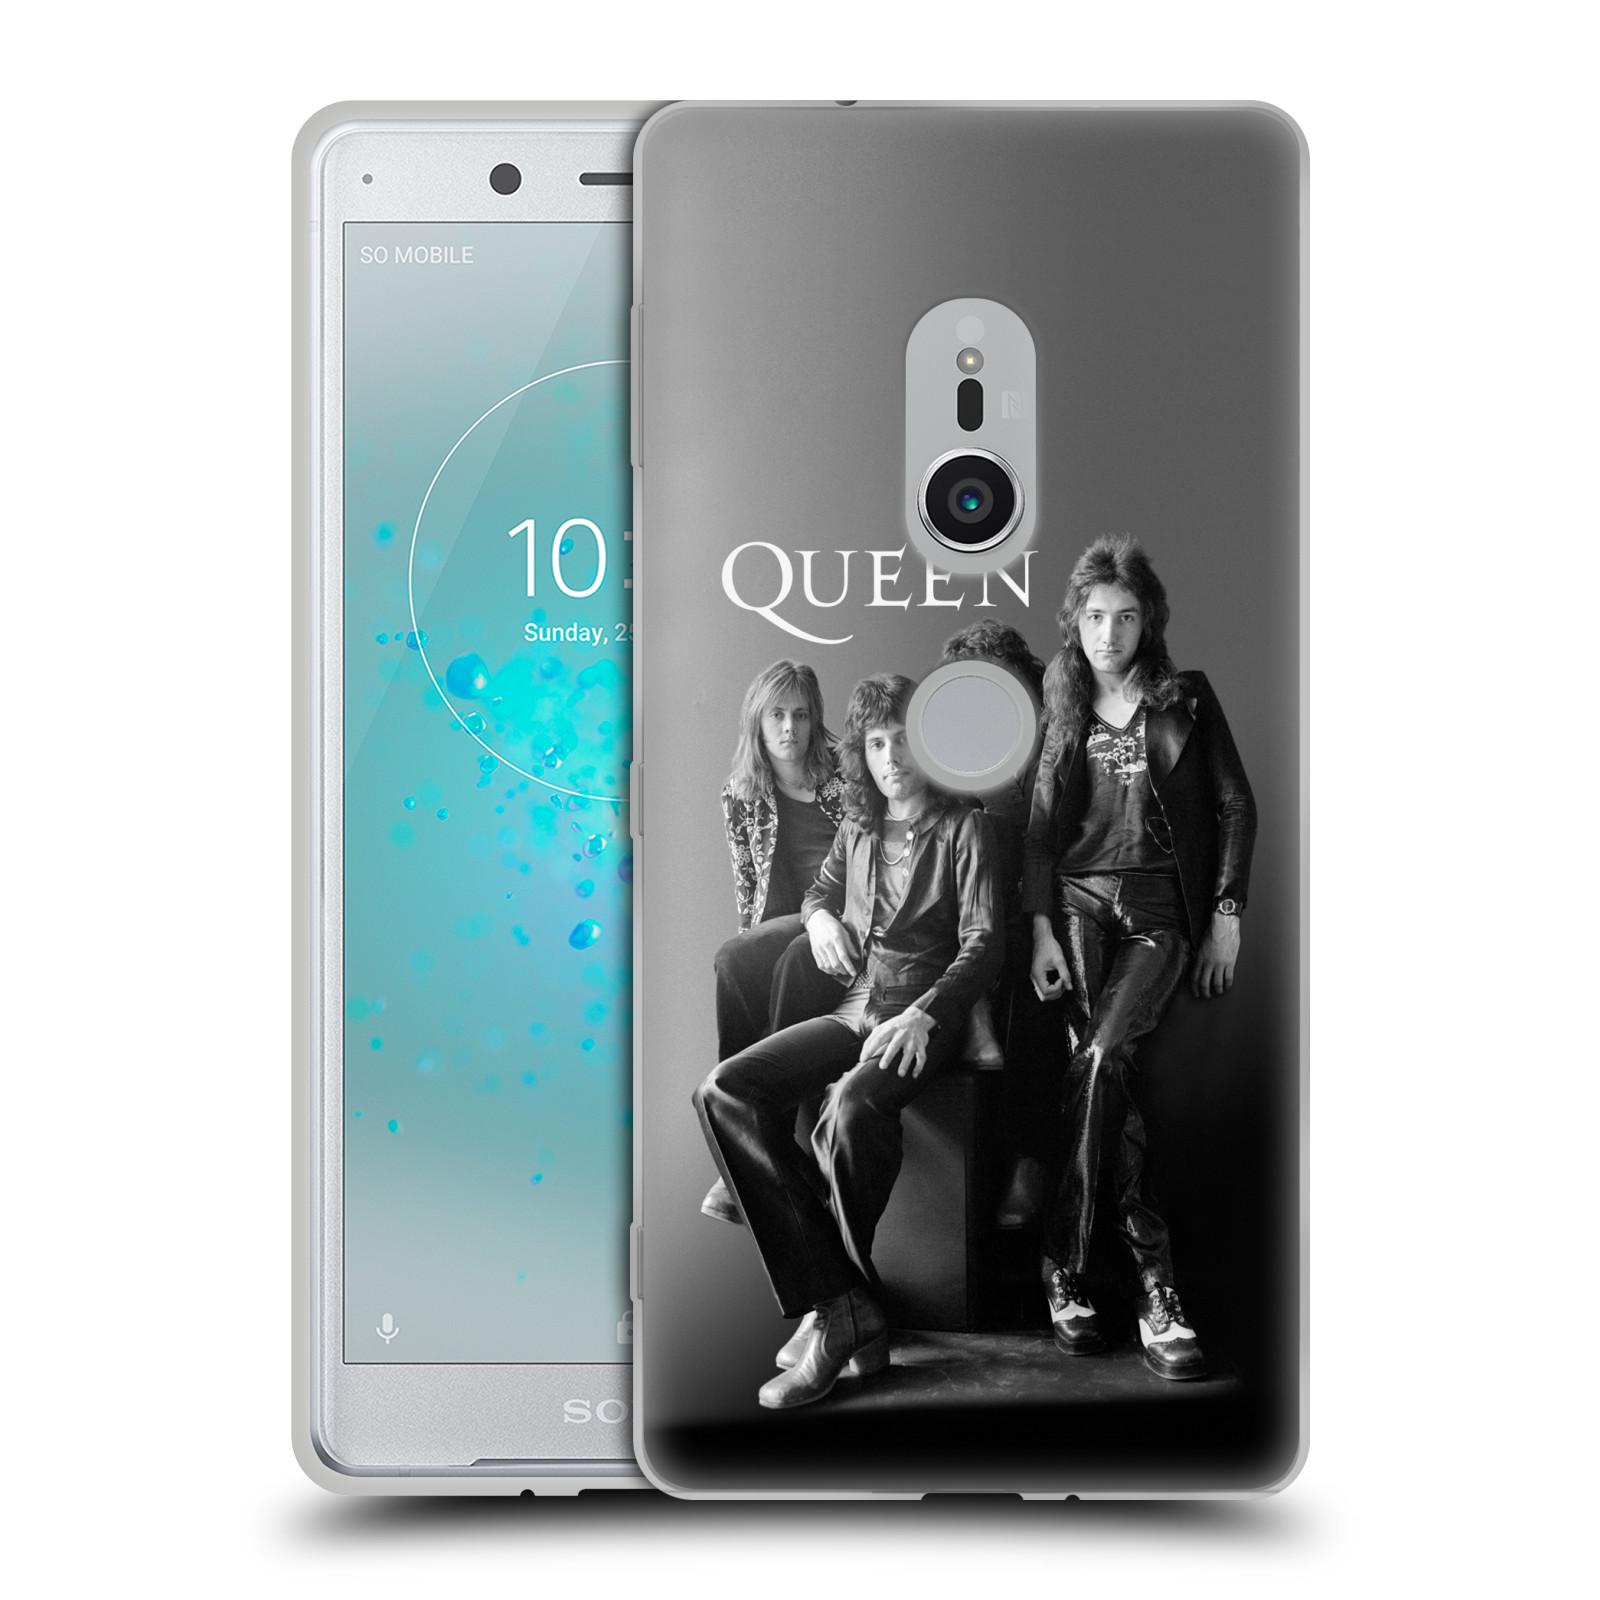 Silikonové pouzdro na mobil Sony Xperia XZ2 - Head Case - Queen - Skupina